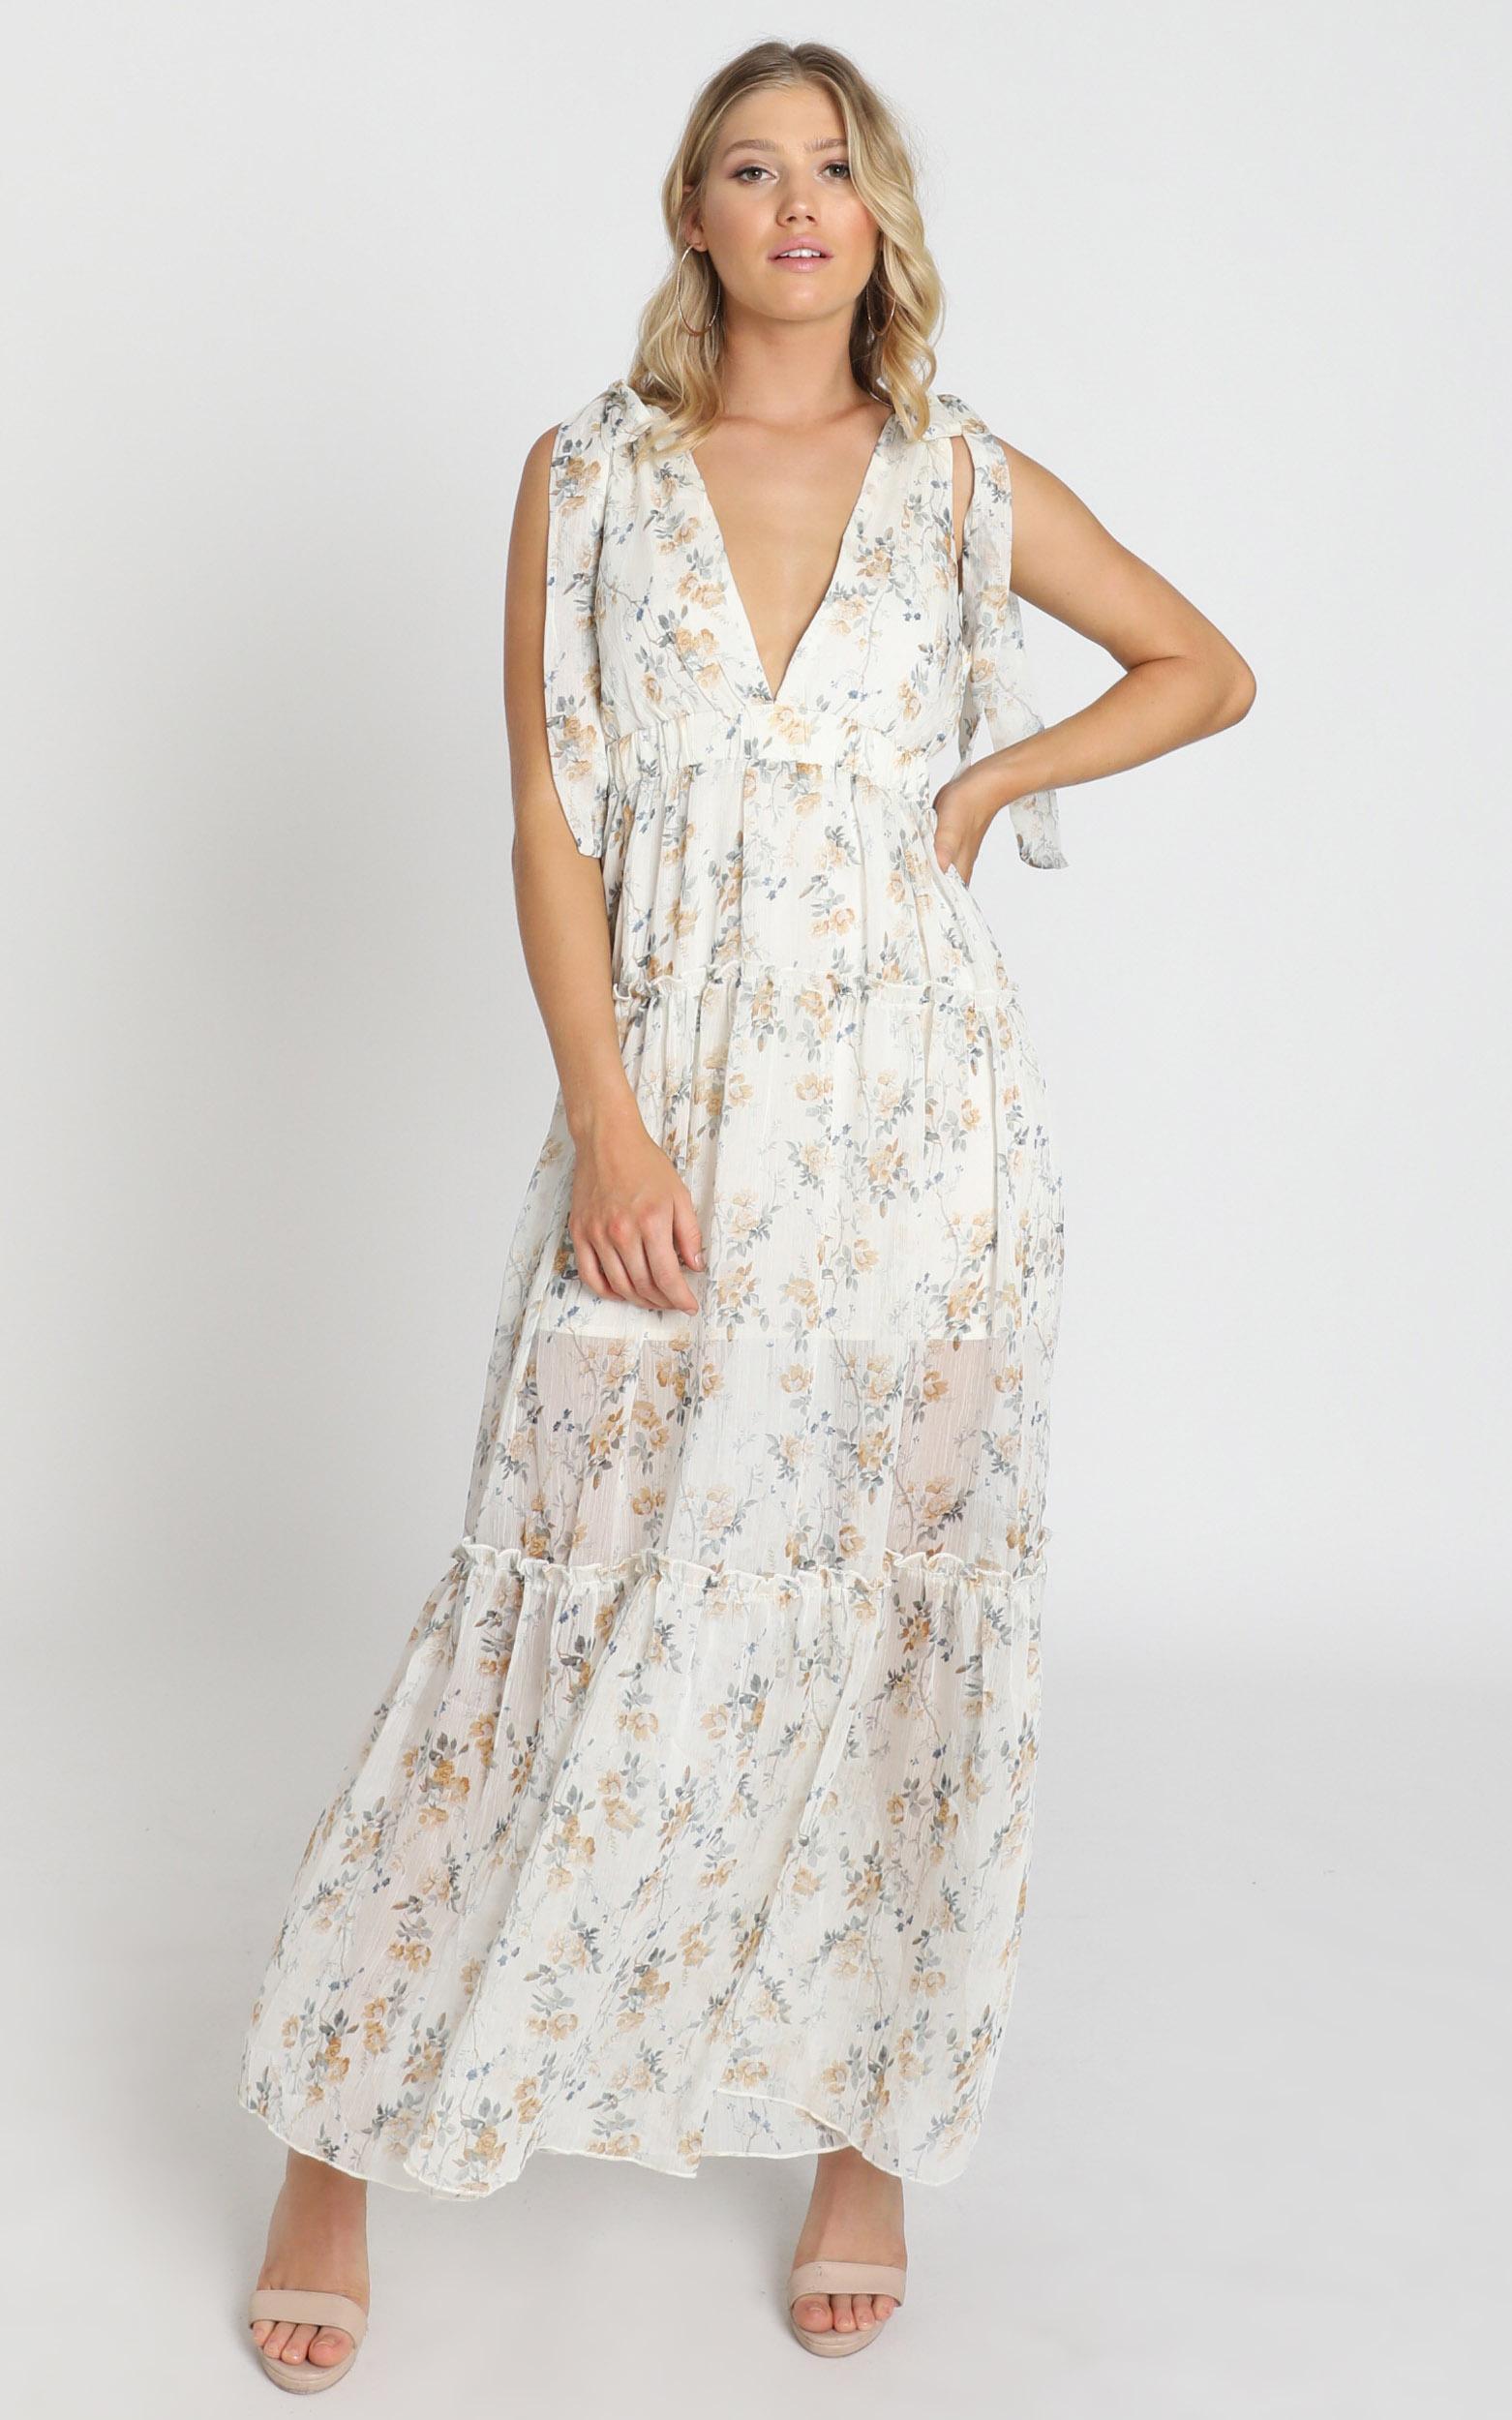 Indra Dress in cream floral - 8 (S), Cream, hi-res image number null